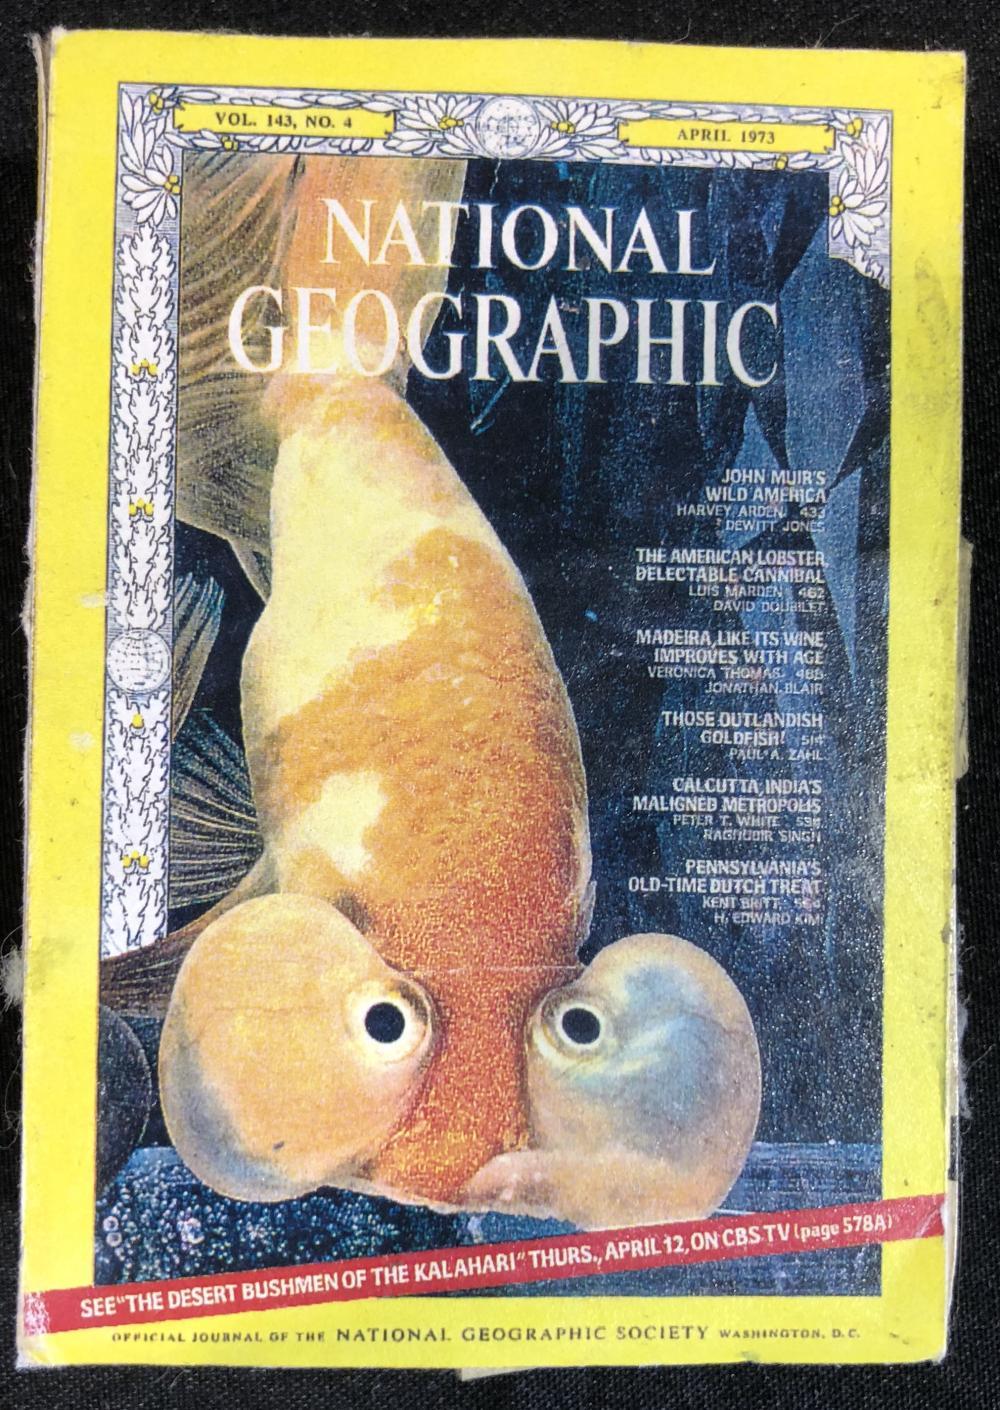 Honey I Blew Up the Kid (1992) - Miniature National Geographic Magazine Set